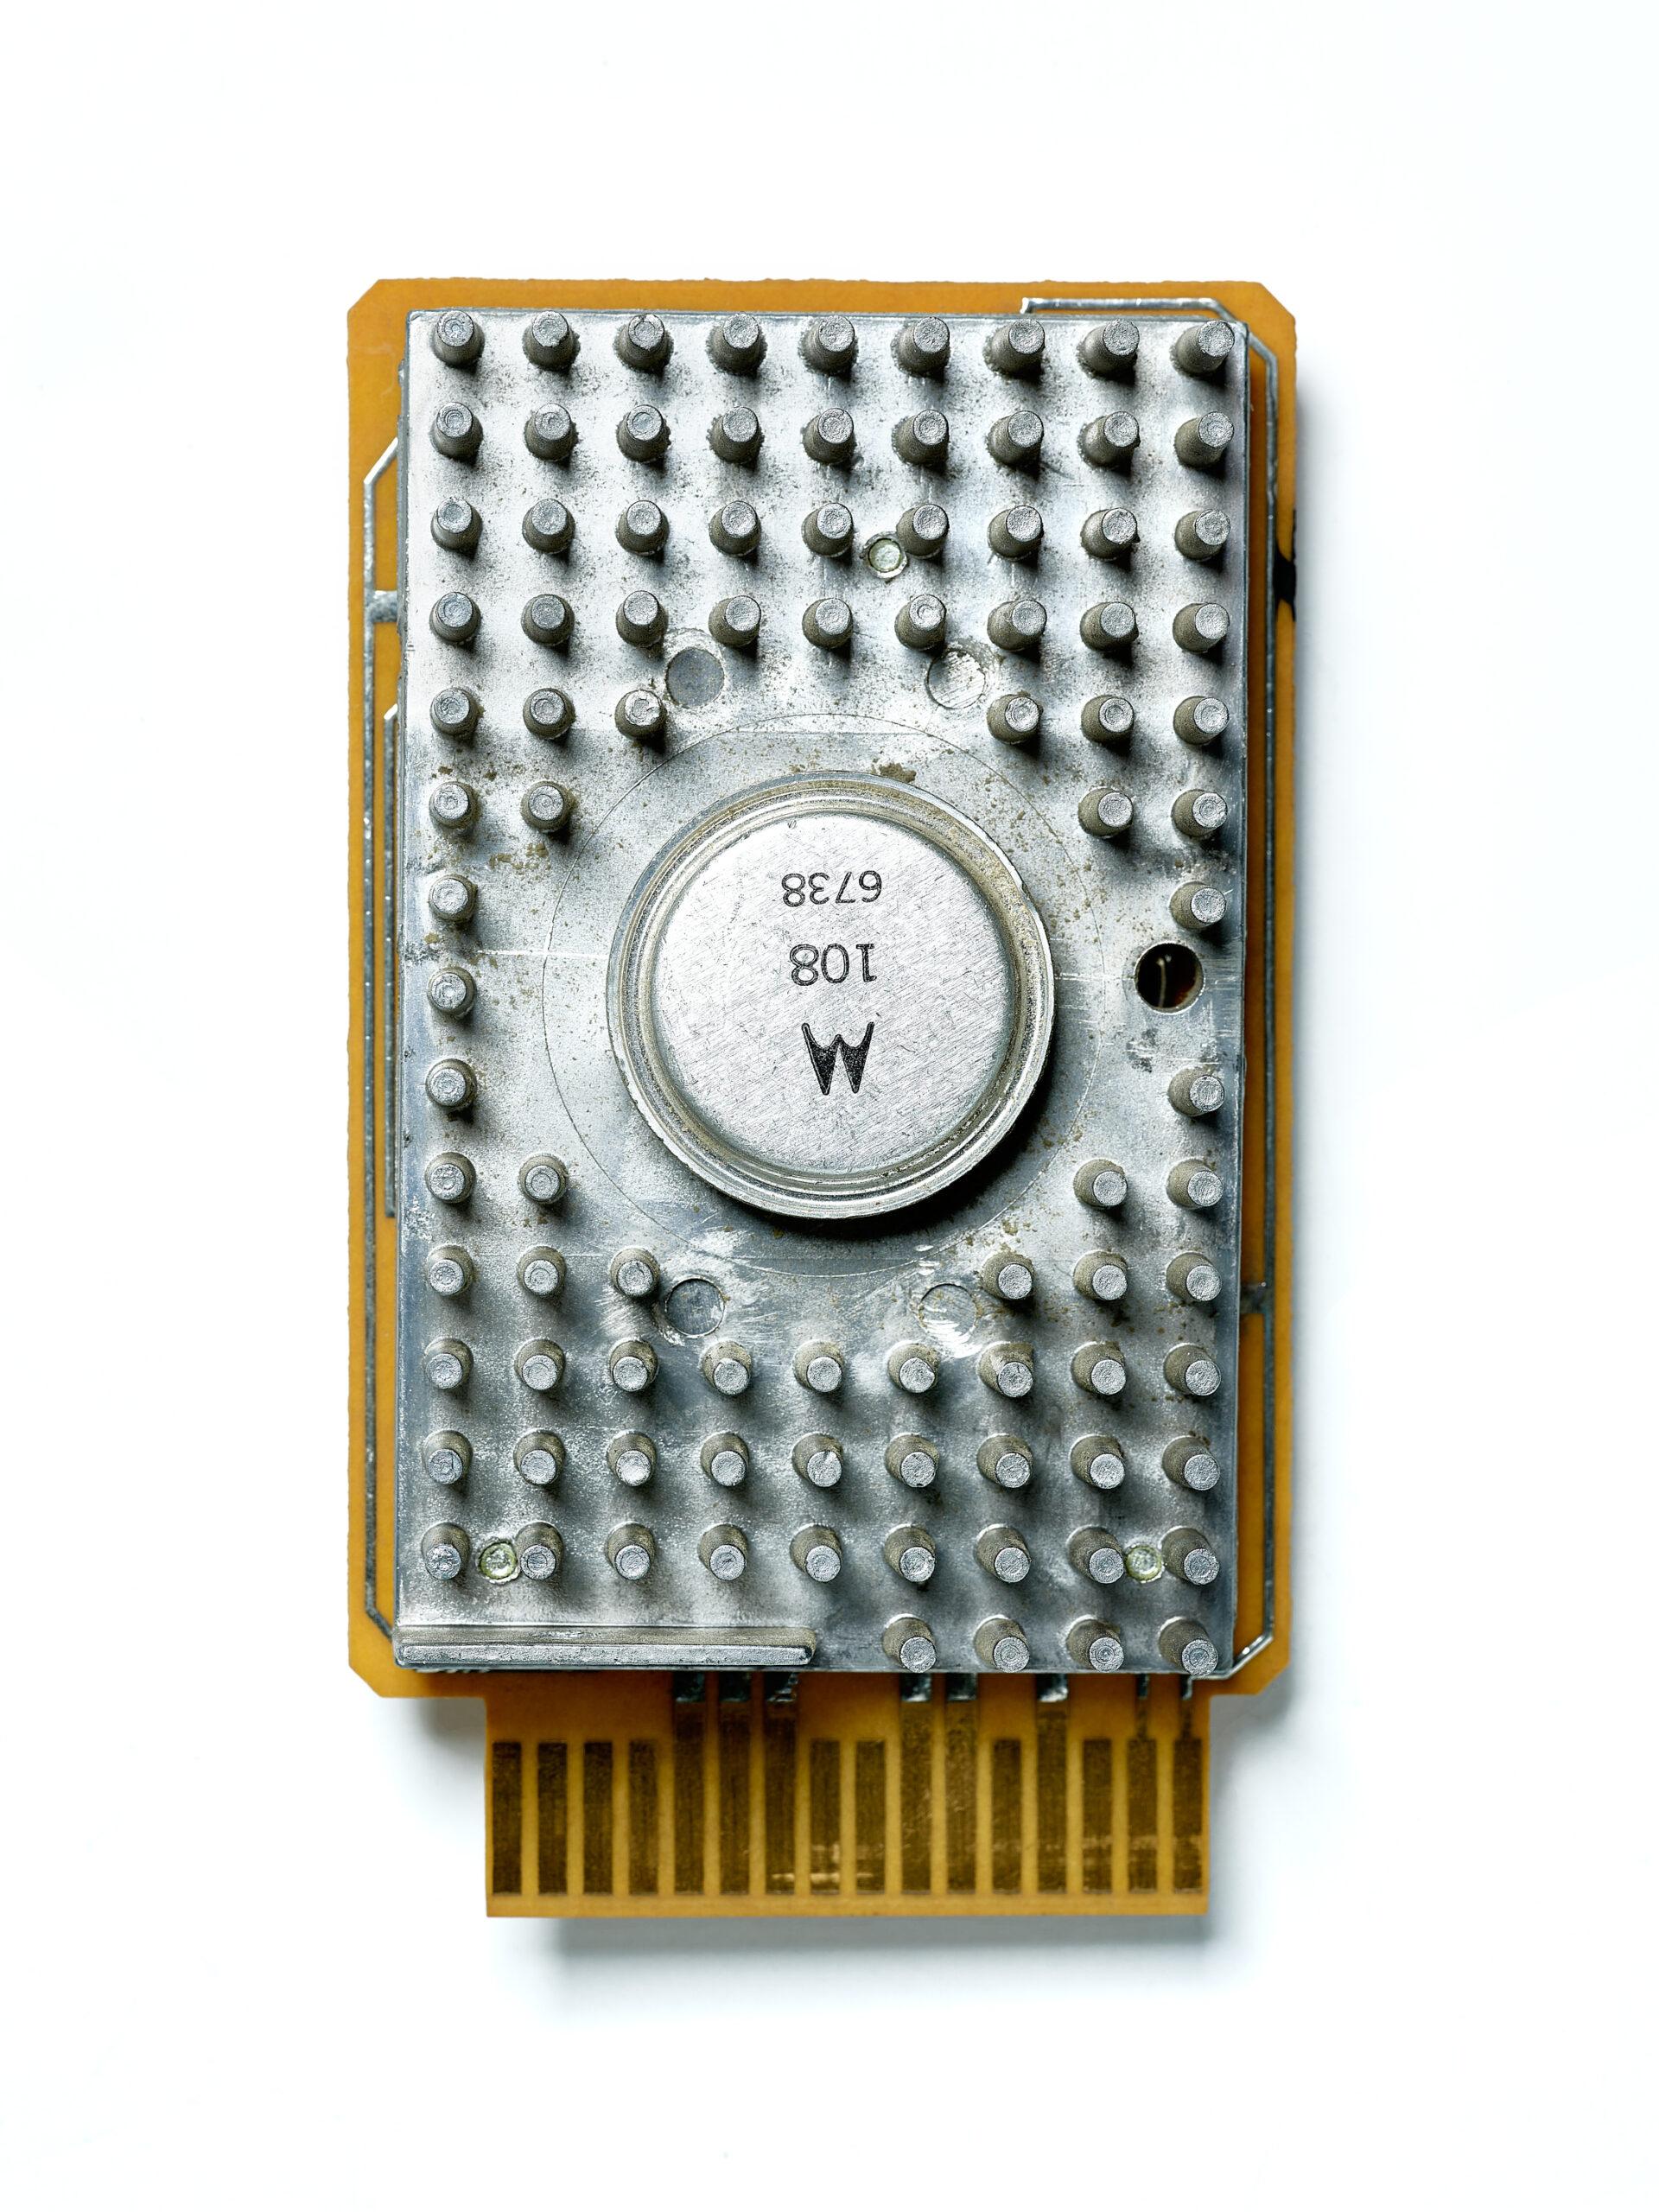 IBM SMS Card EDA. SMS Card, circuit board, computer, mainframe, tech history, transistors, vintage computing.